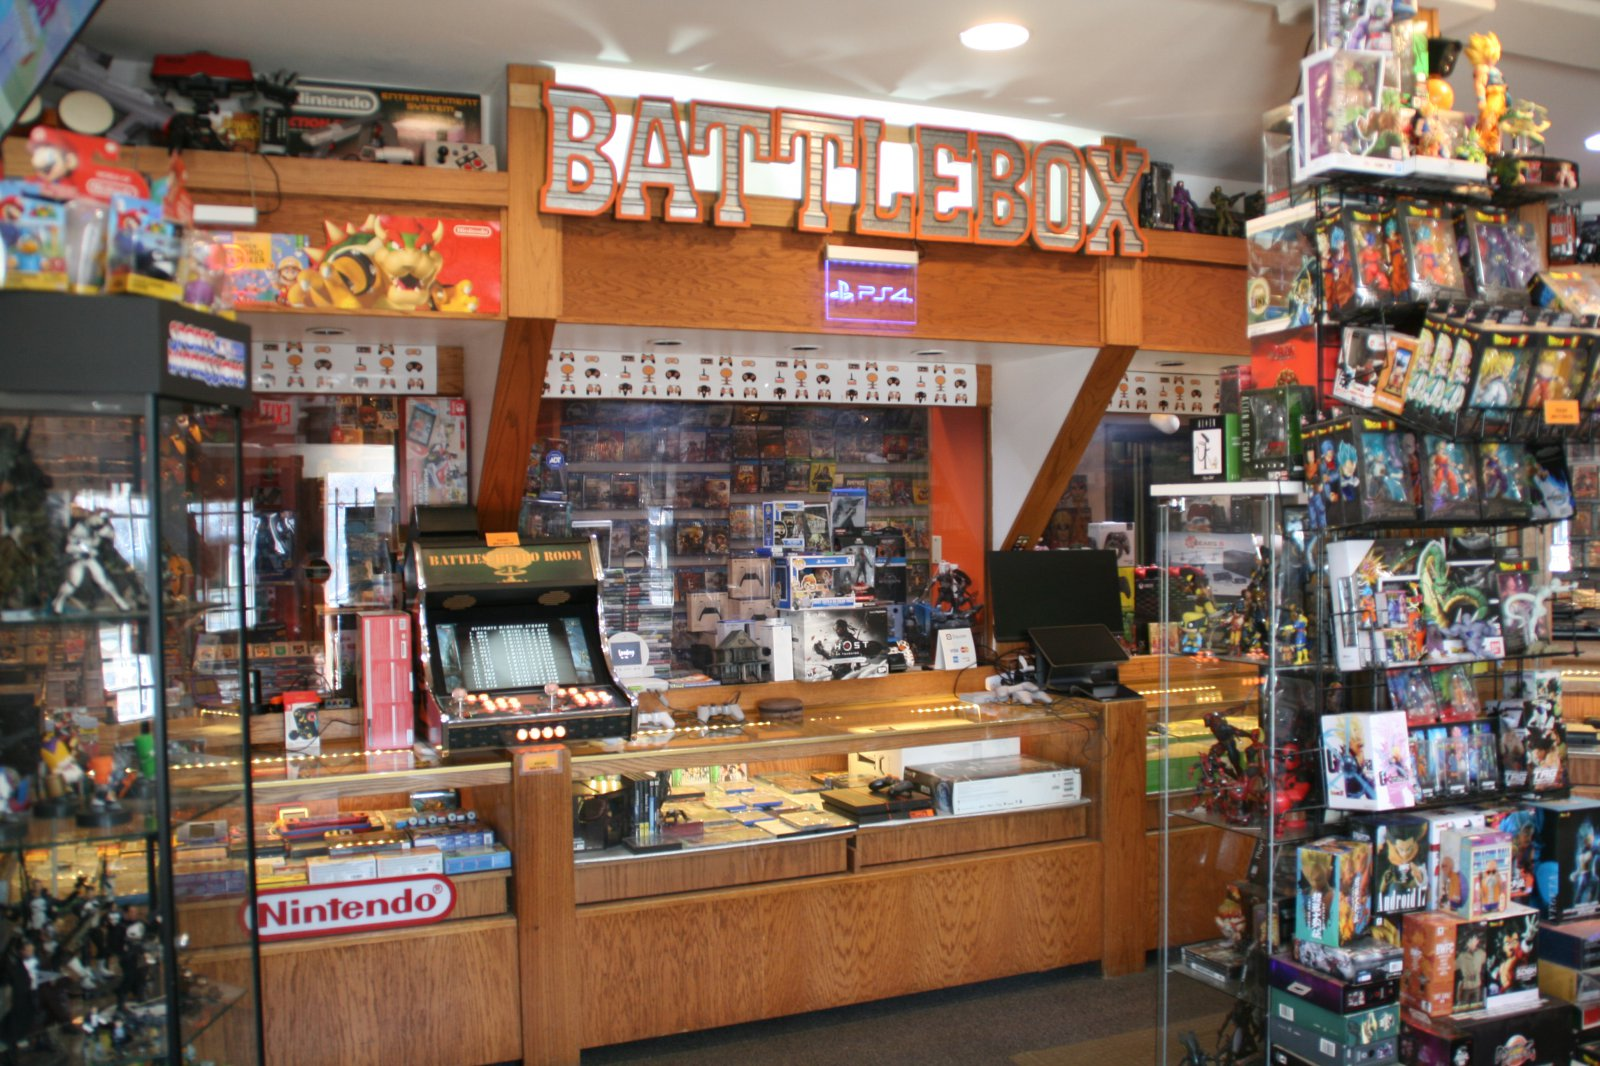 Battlebox Studios